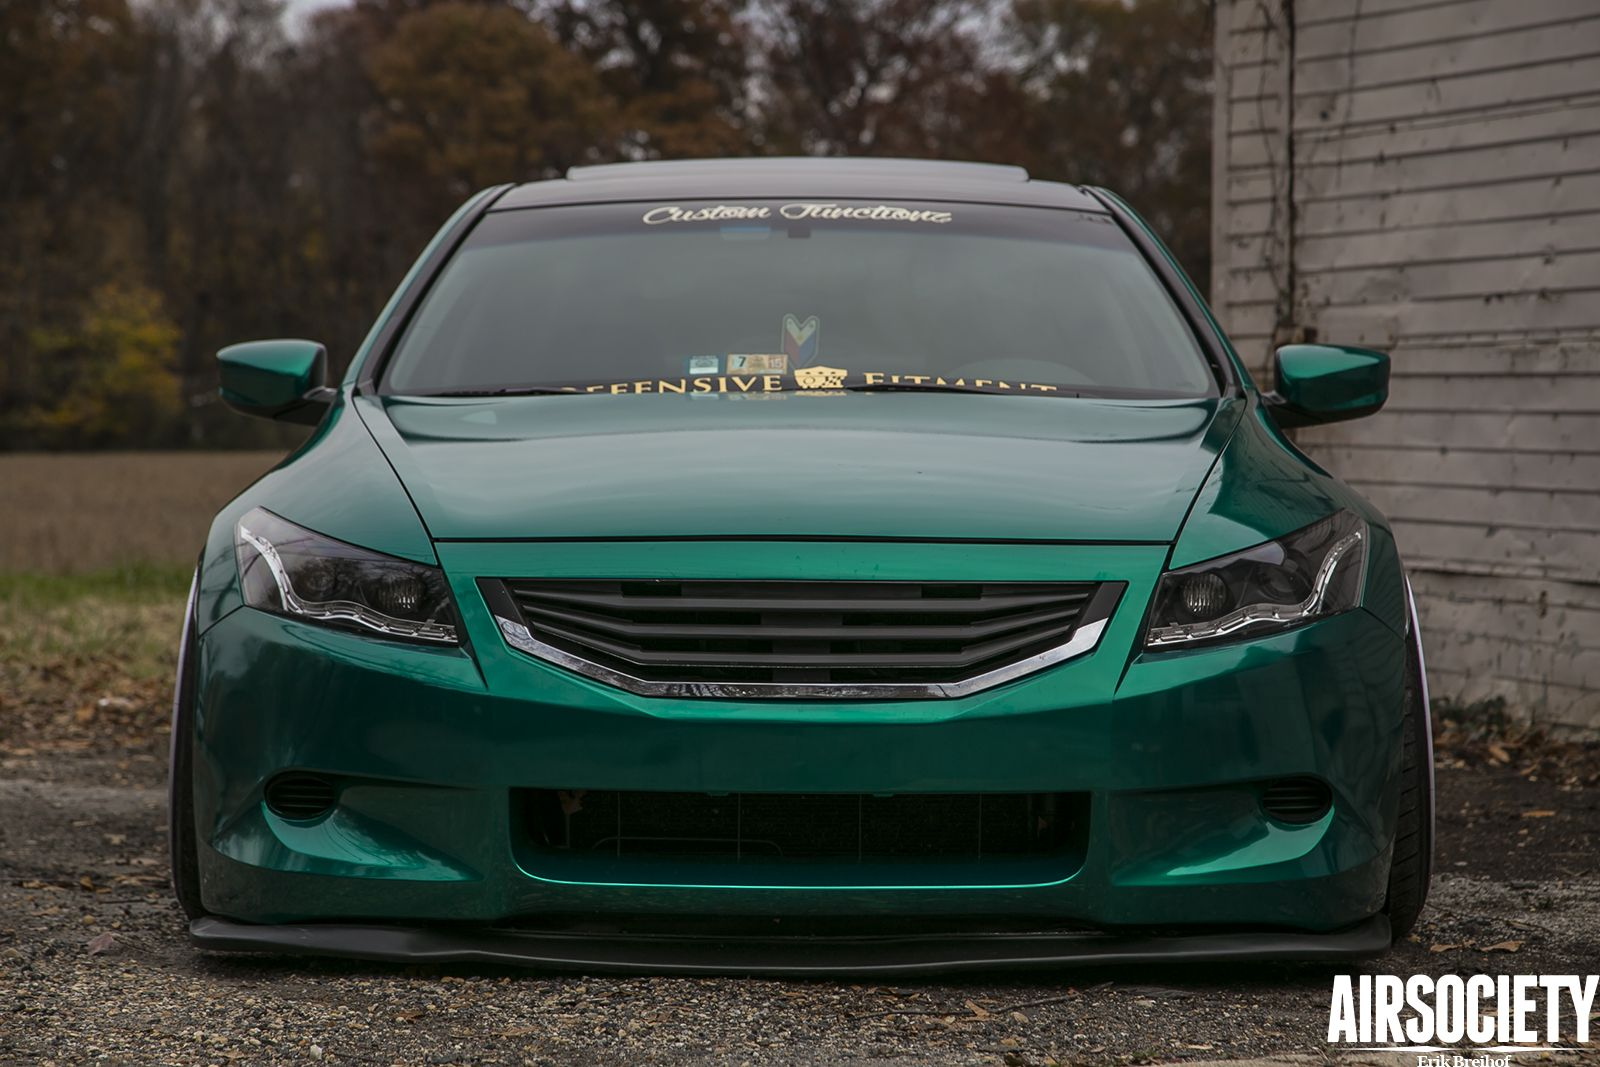 The Emerald Dream Custom Functionz' 2009 Honda Accord